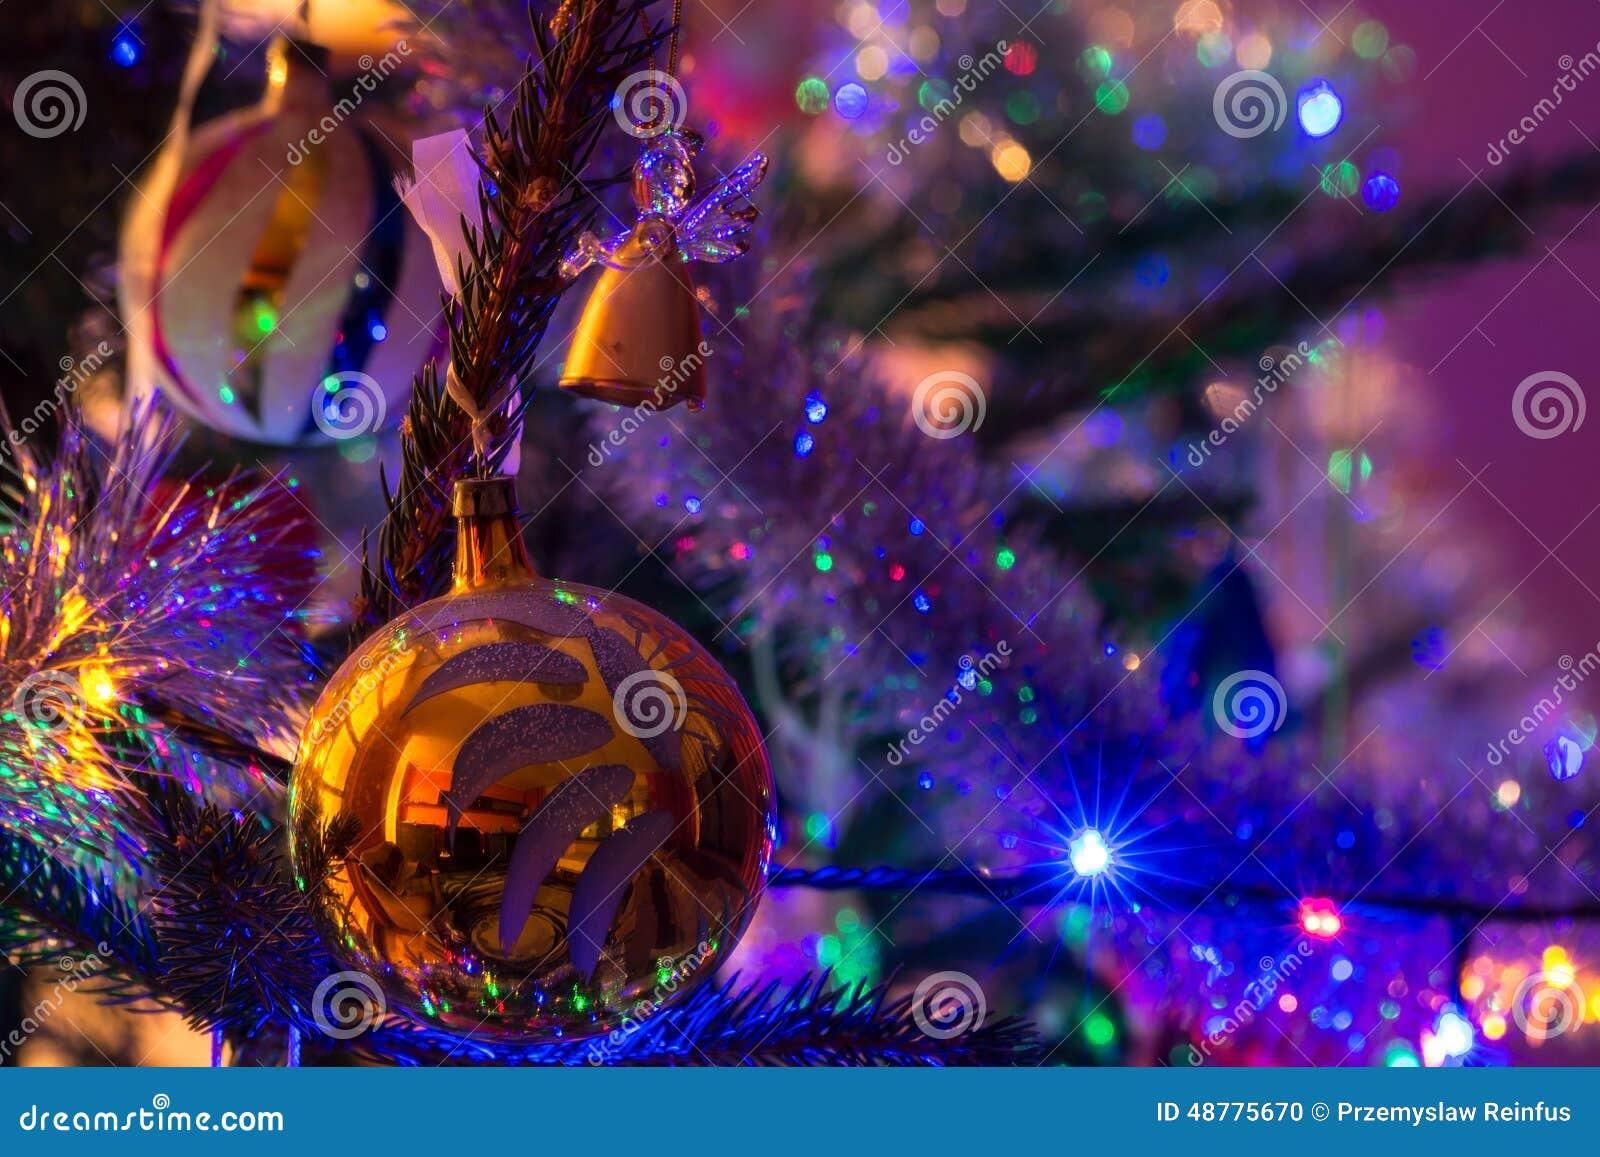 Christmas Bomb Stock Photo - Image: 48775670